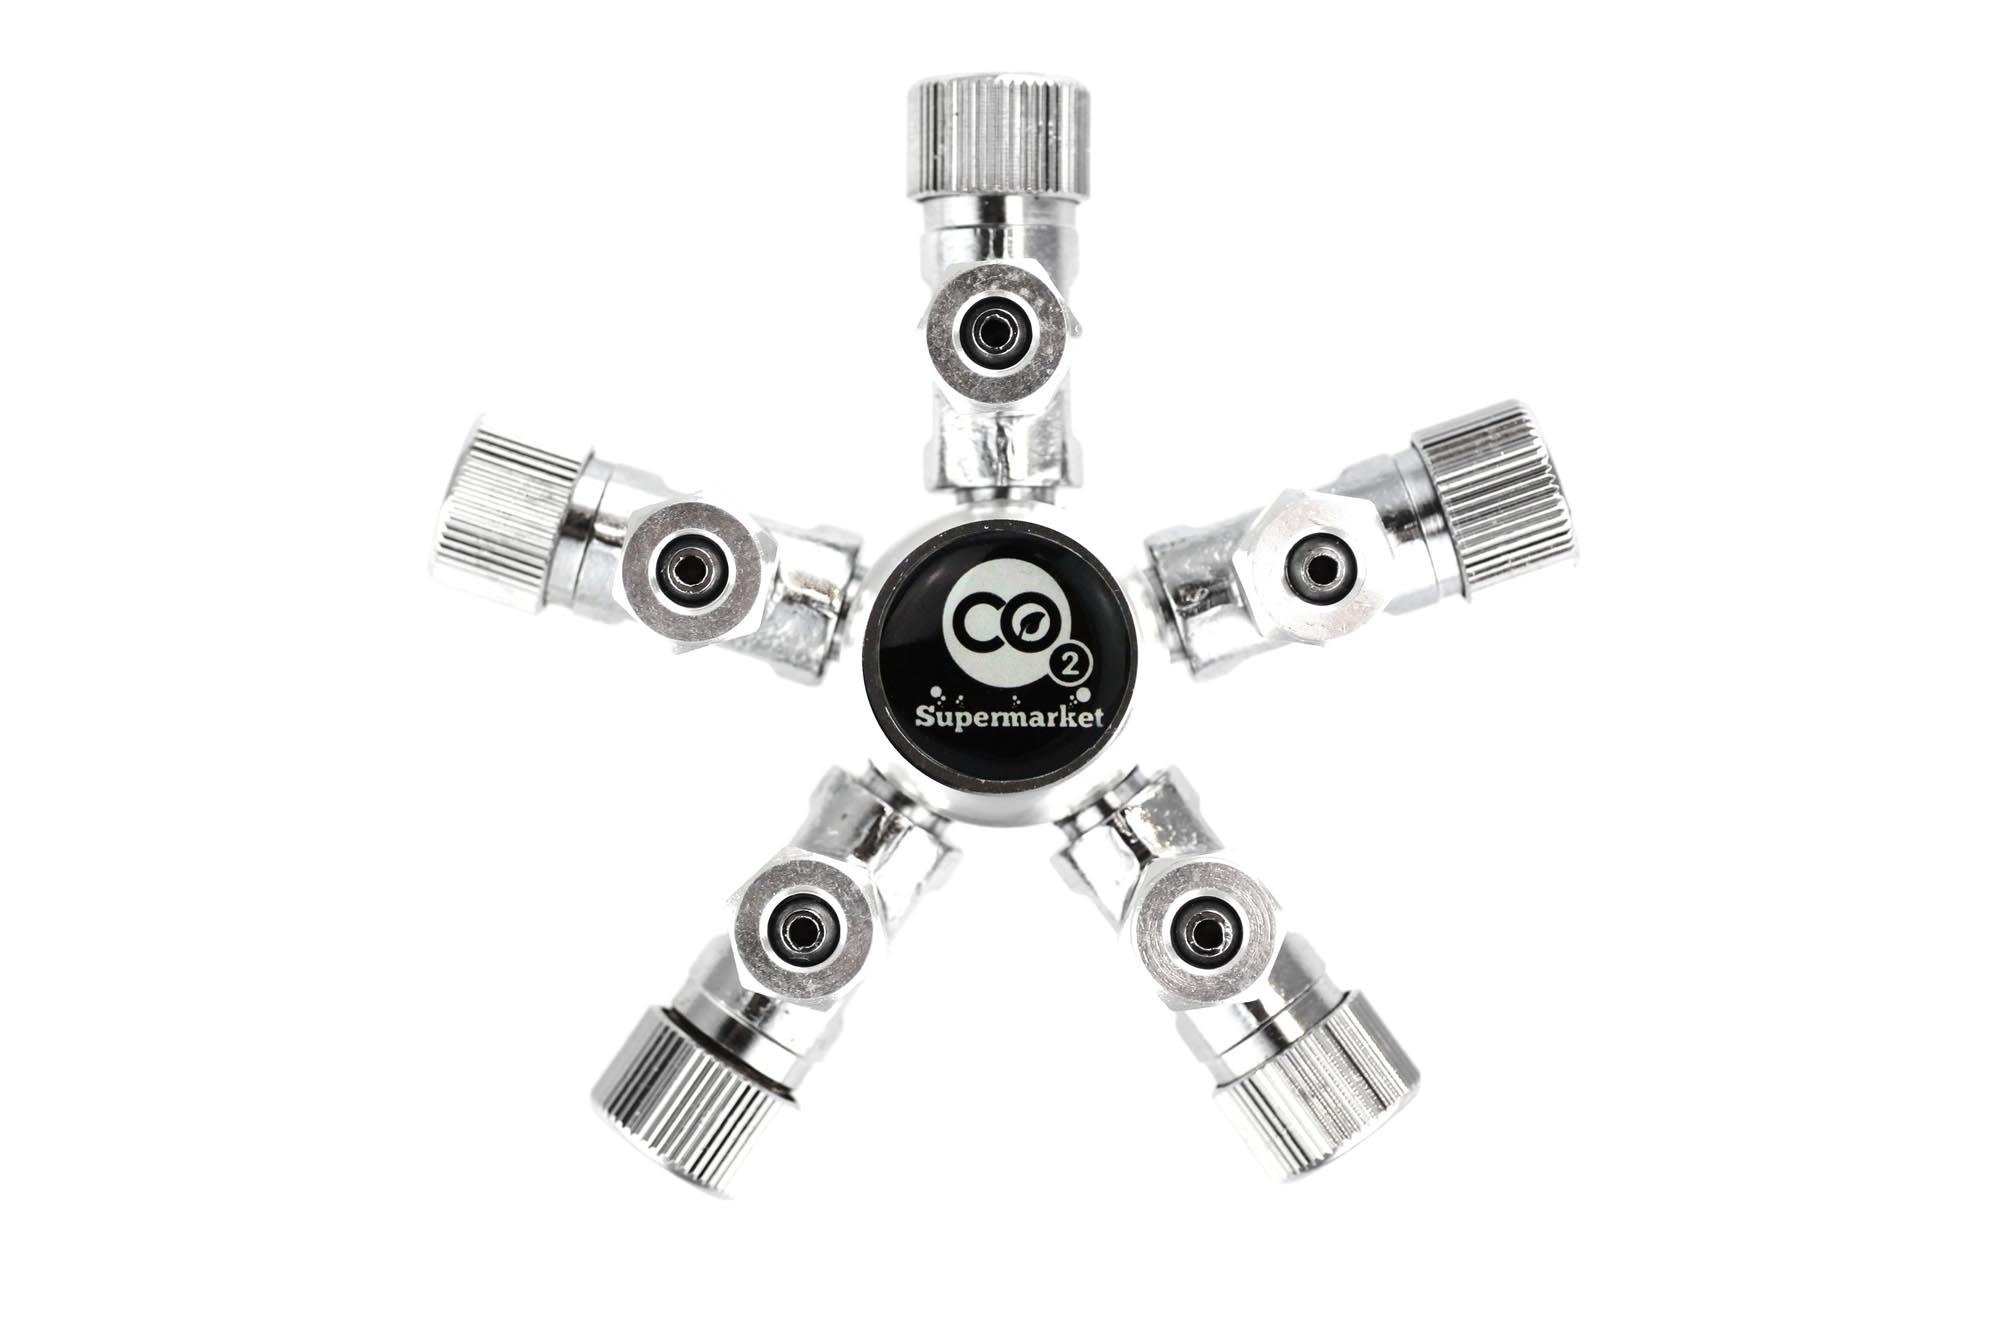 Aquarium 5 Way Co2 Splitter For Solenoid Or Regulator